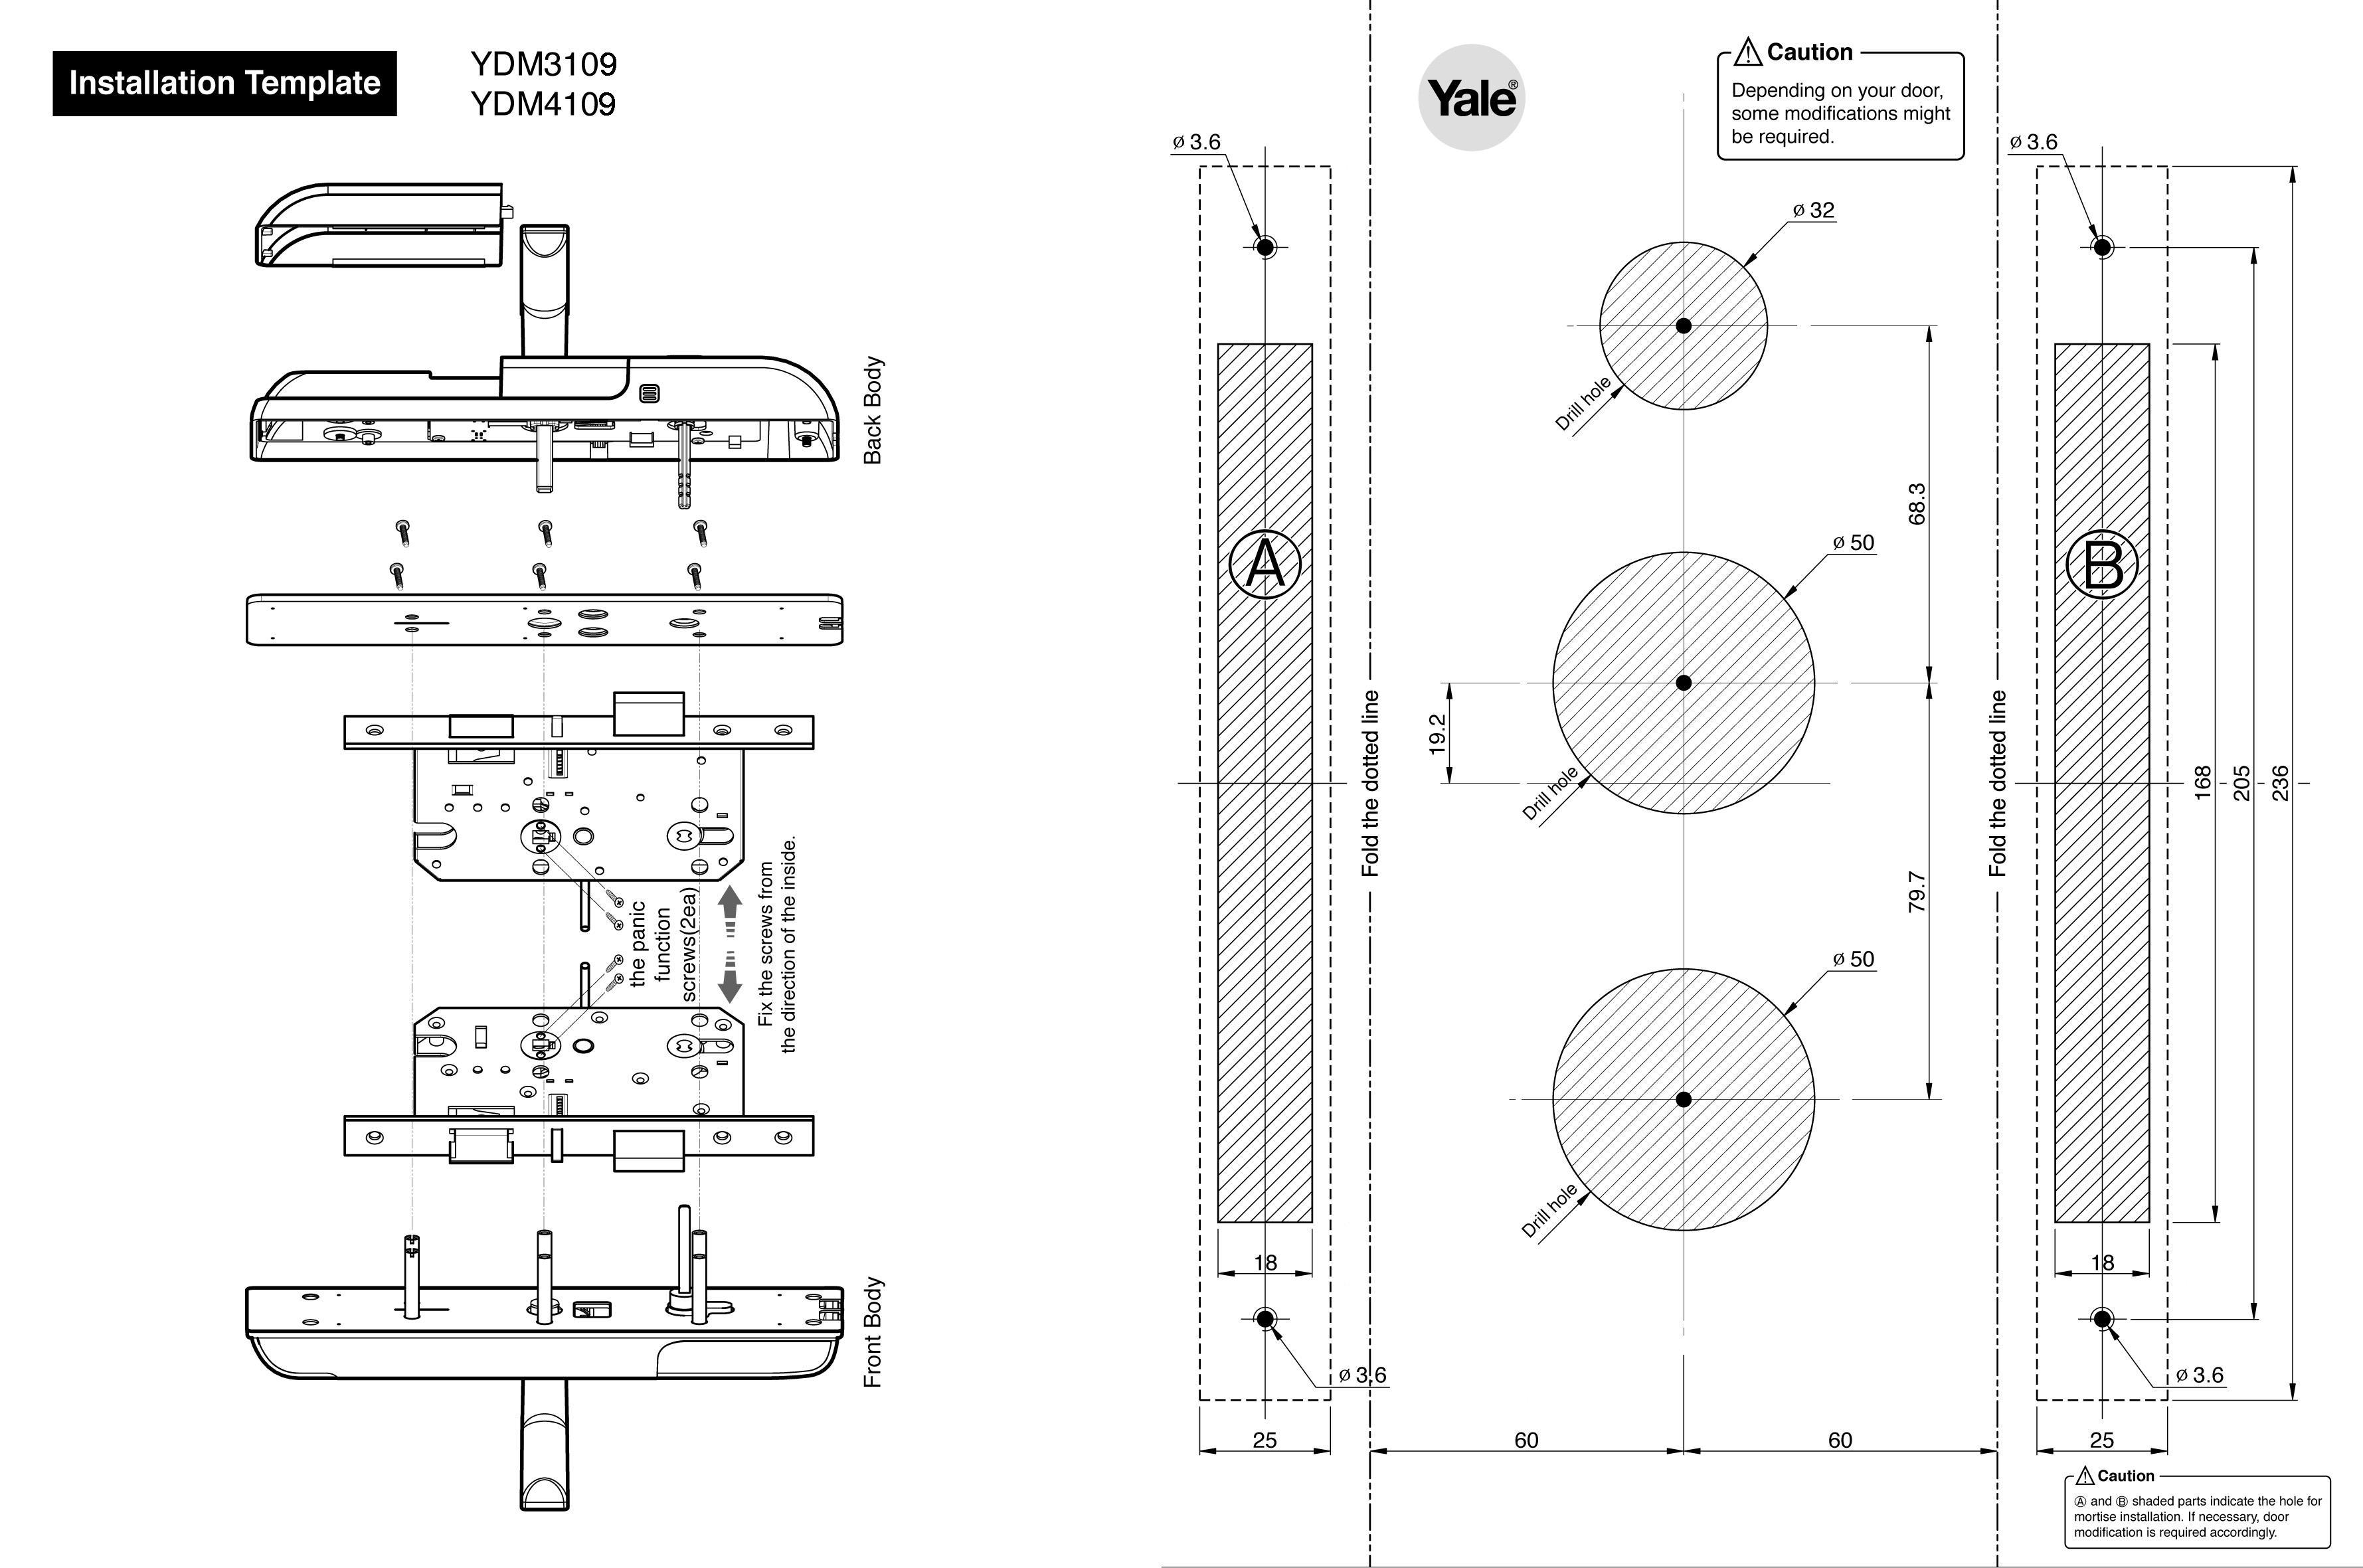 Ydm4109 Yale Asia Fridge Door Alarm Circuit Tiny Guard With Ydm3109 Installation Guide En 641 Kb